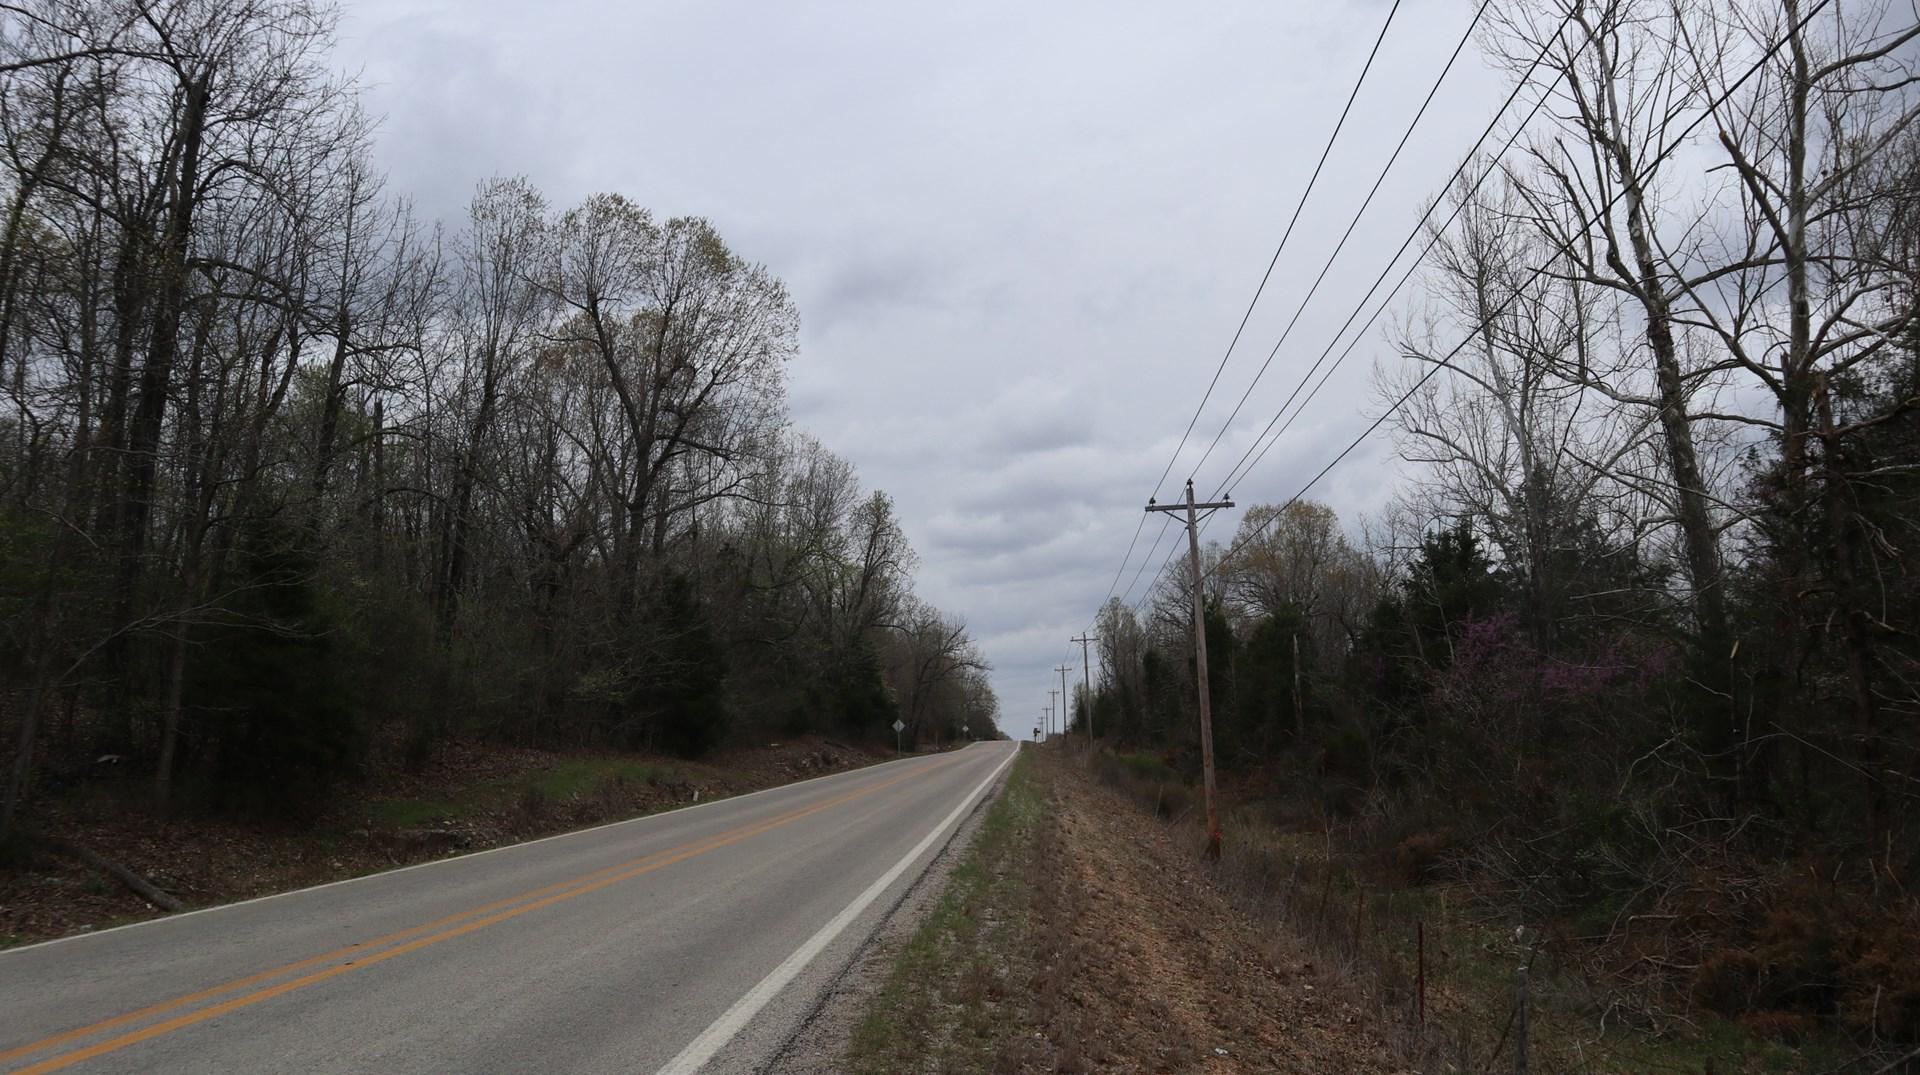 Highway Frontage Property for Sale near Salem Arkansas